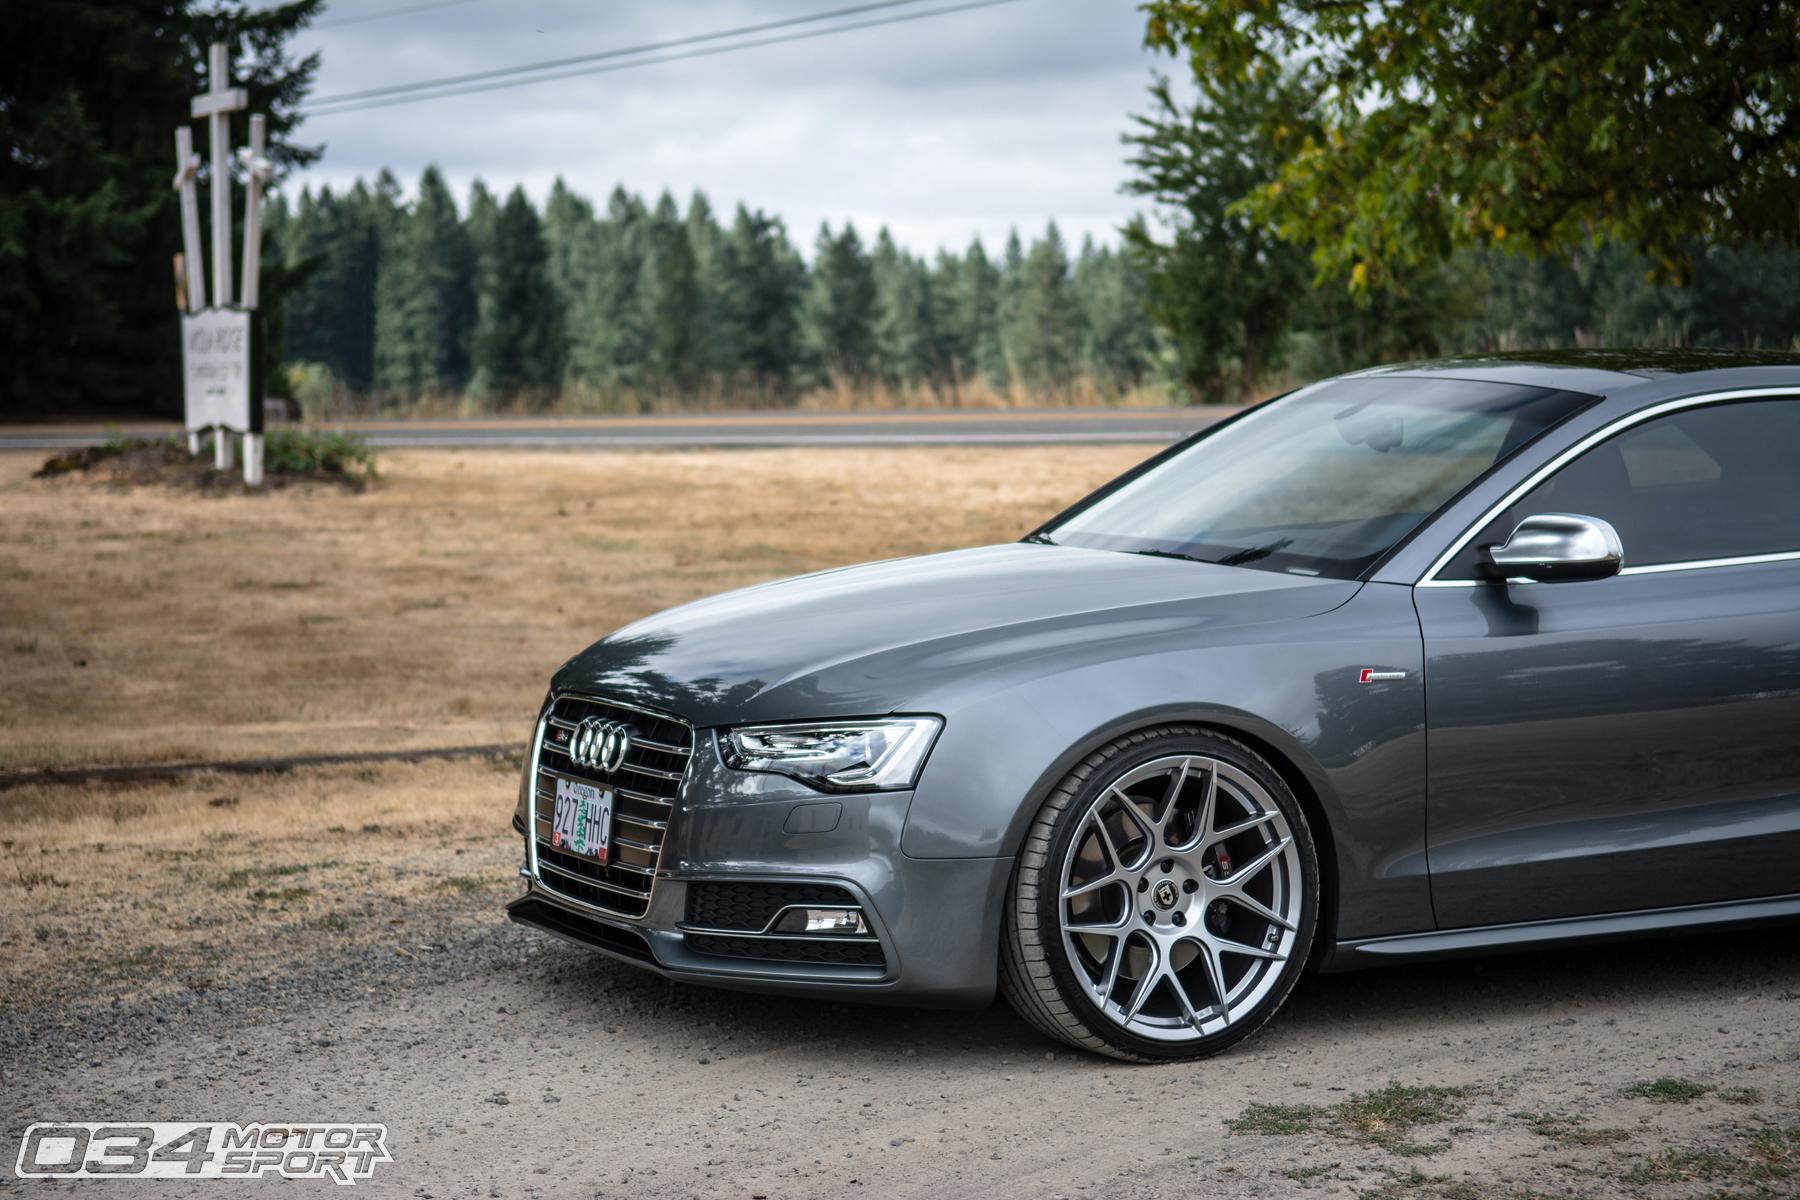 Don S Monsoon Gray B8 5 Audi S5 3 0 Tfsi 034motorsport Blog